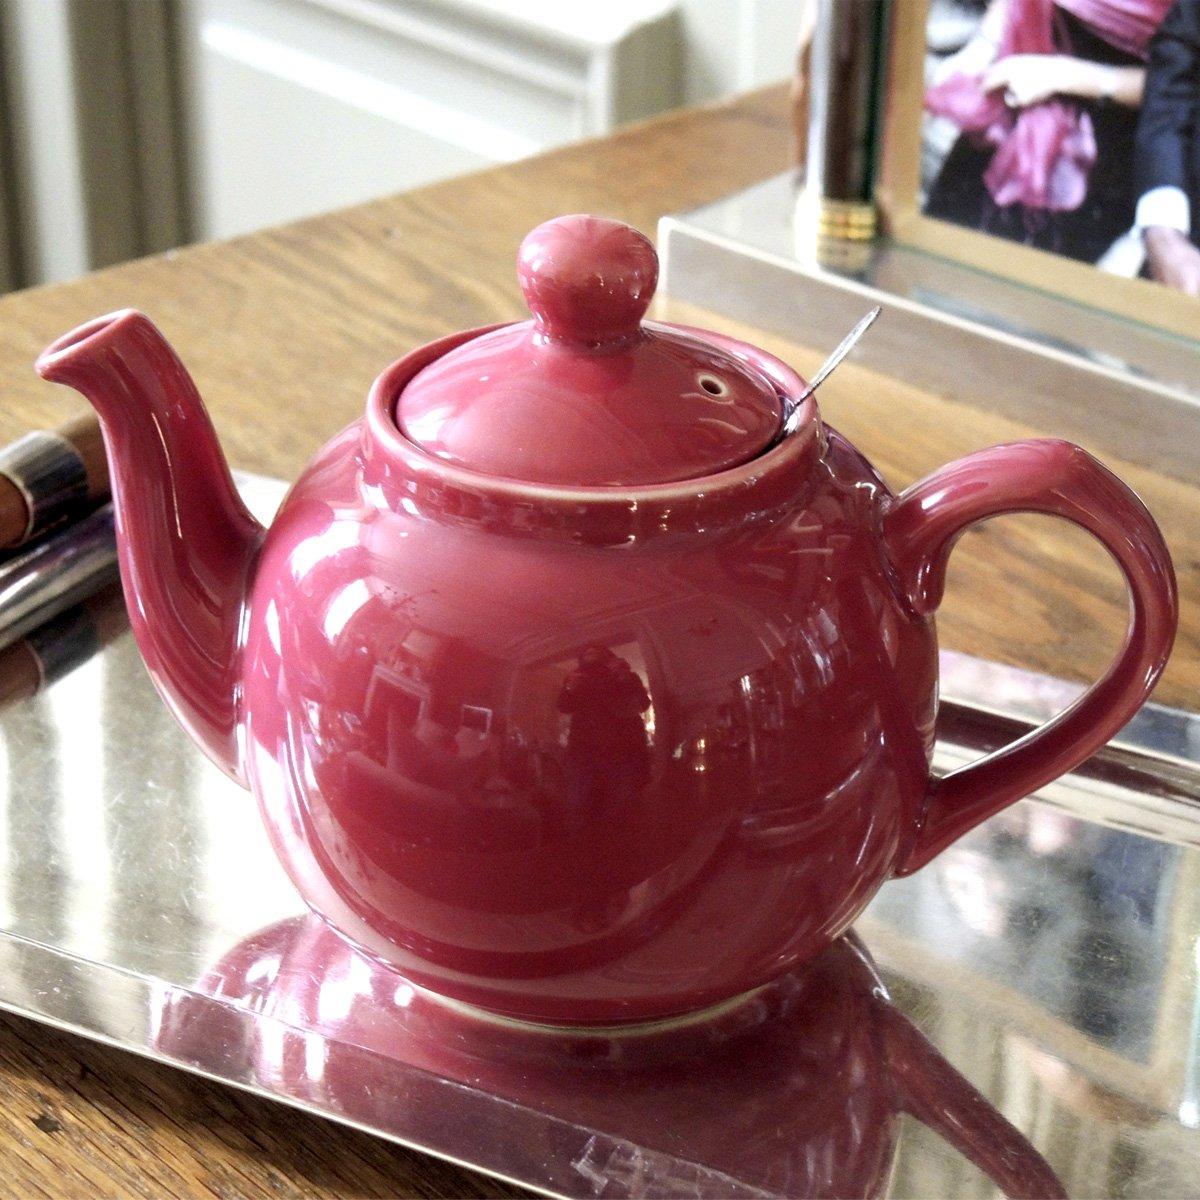 Aqua London Pottery Farmhouse Small Teapot with Infuser 2 Cup Ceramic 500 ml